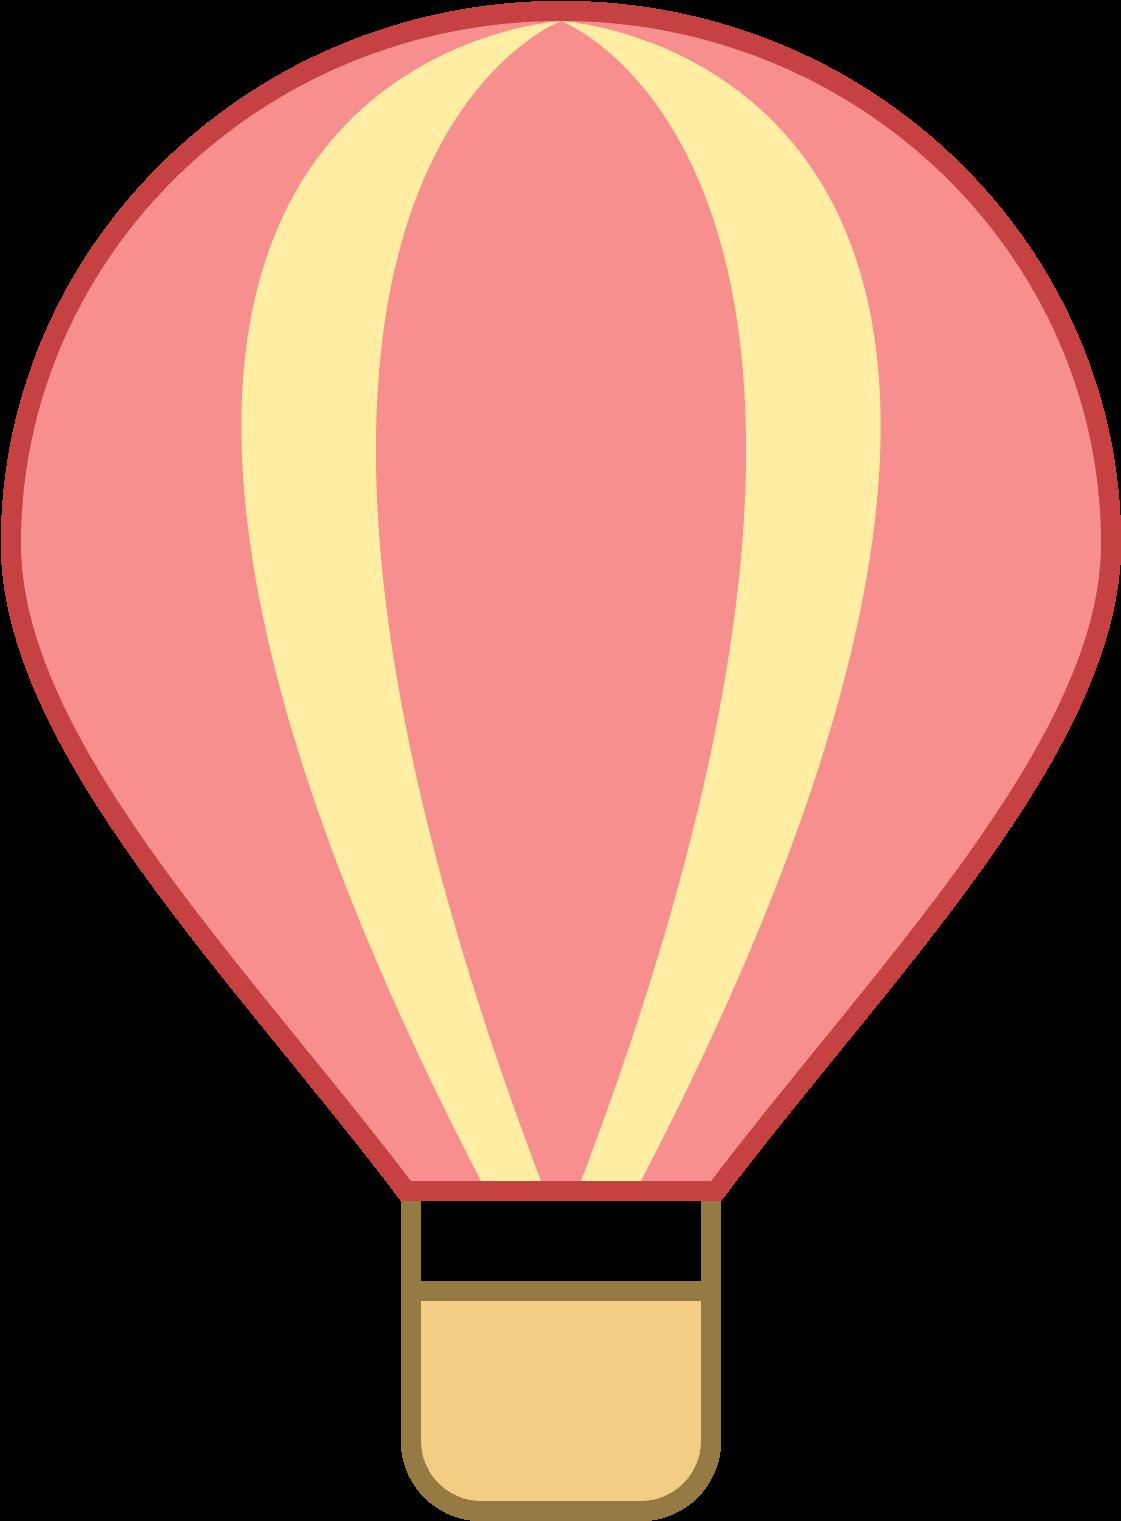 Picture Transparent Library Baloon Vector Globos Air Balloon.